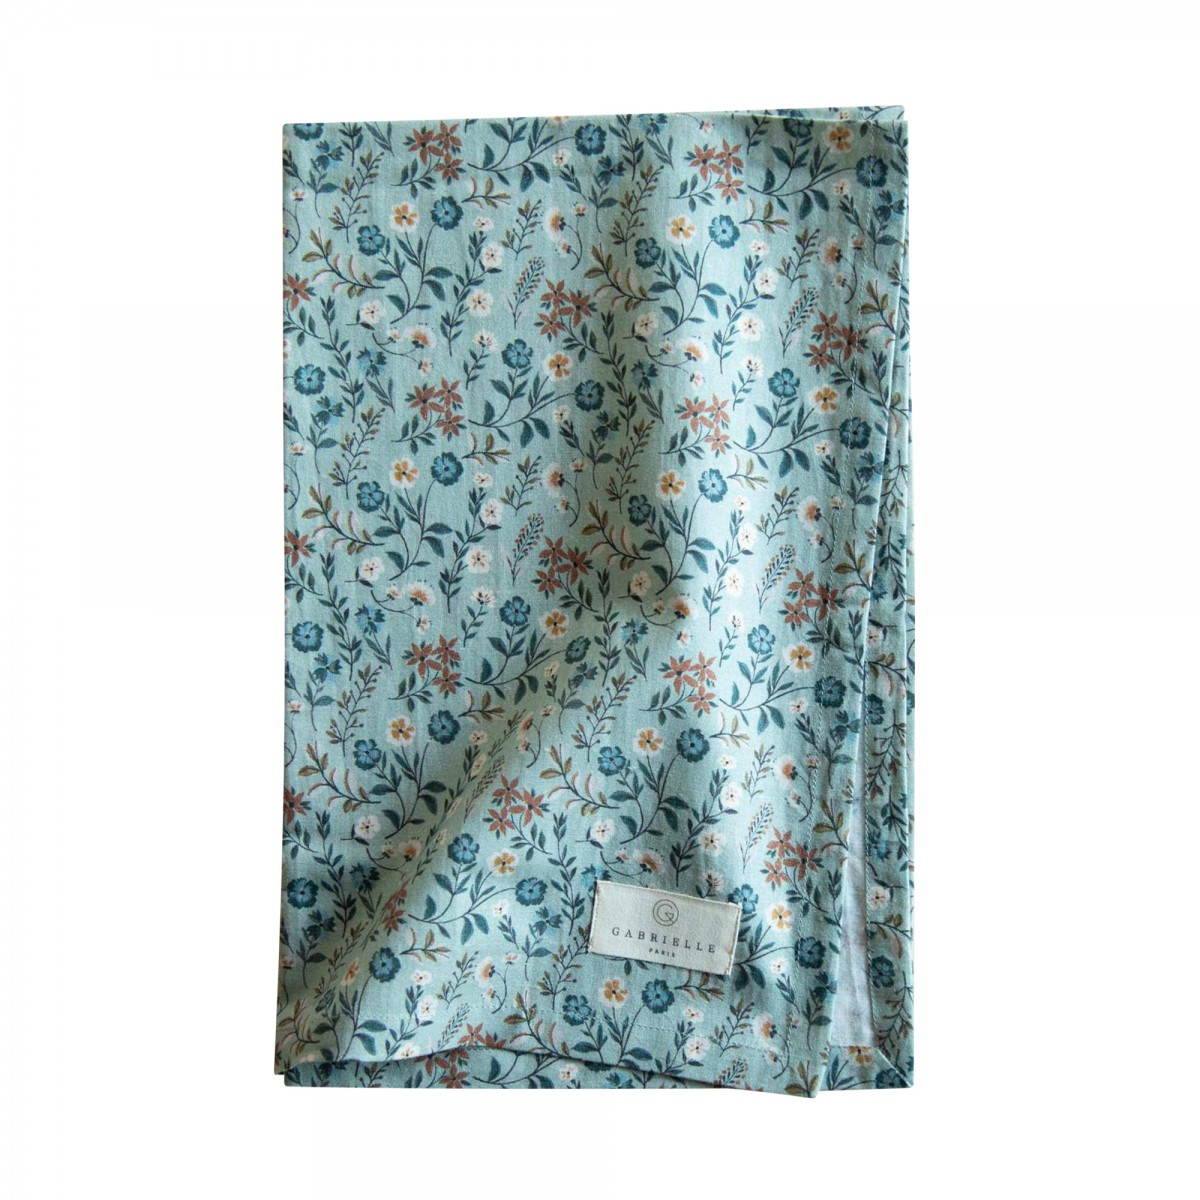 Torchon en coton imprimé fleuri bleu